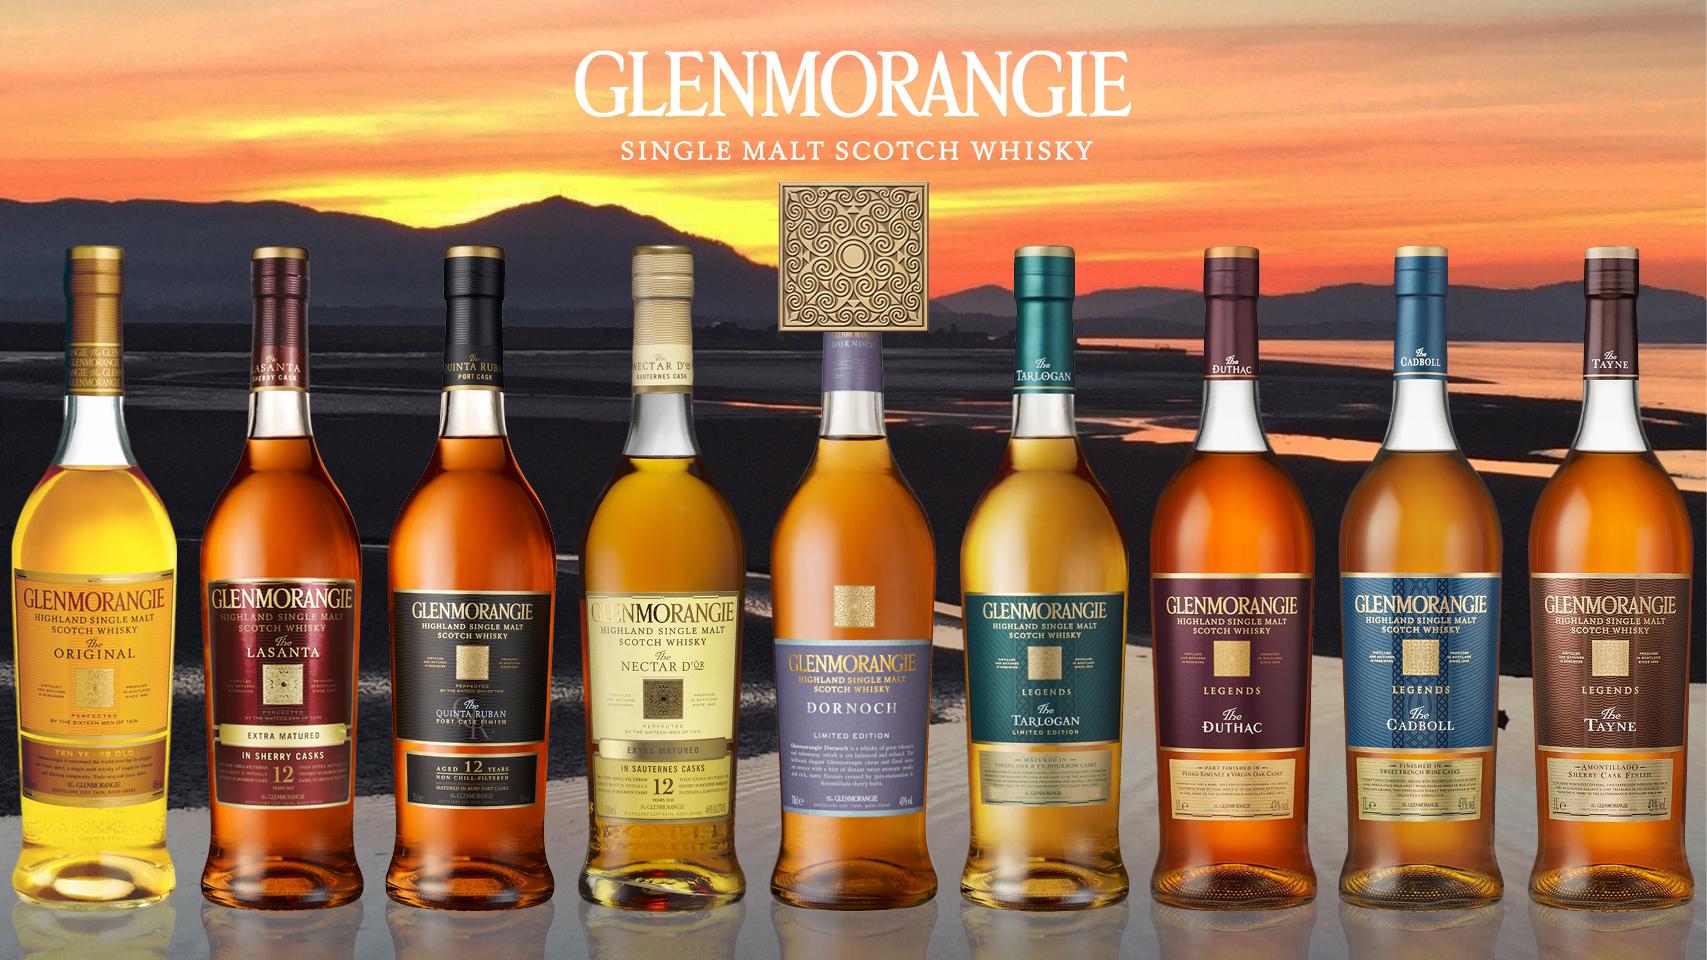 brand-page-banner-glenmorangie-310519.jpg